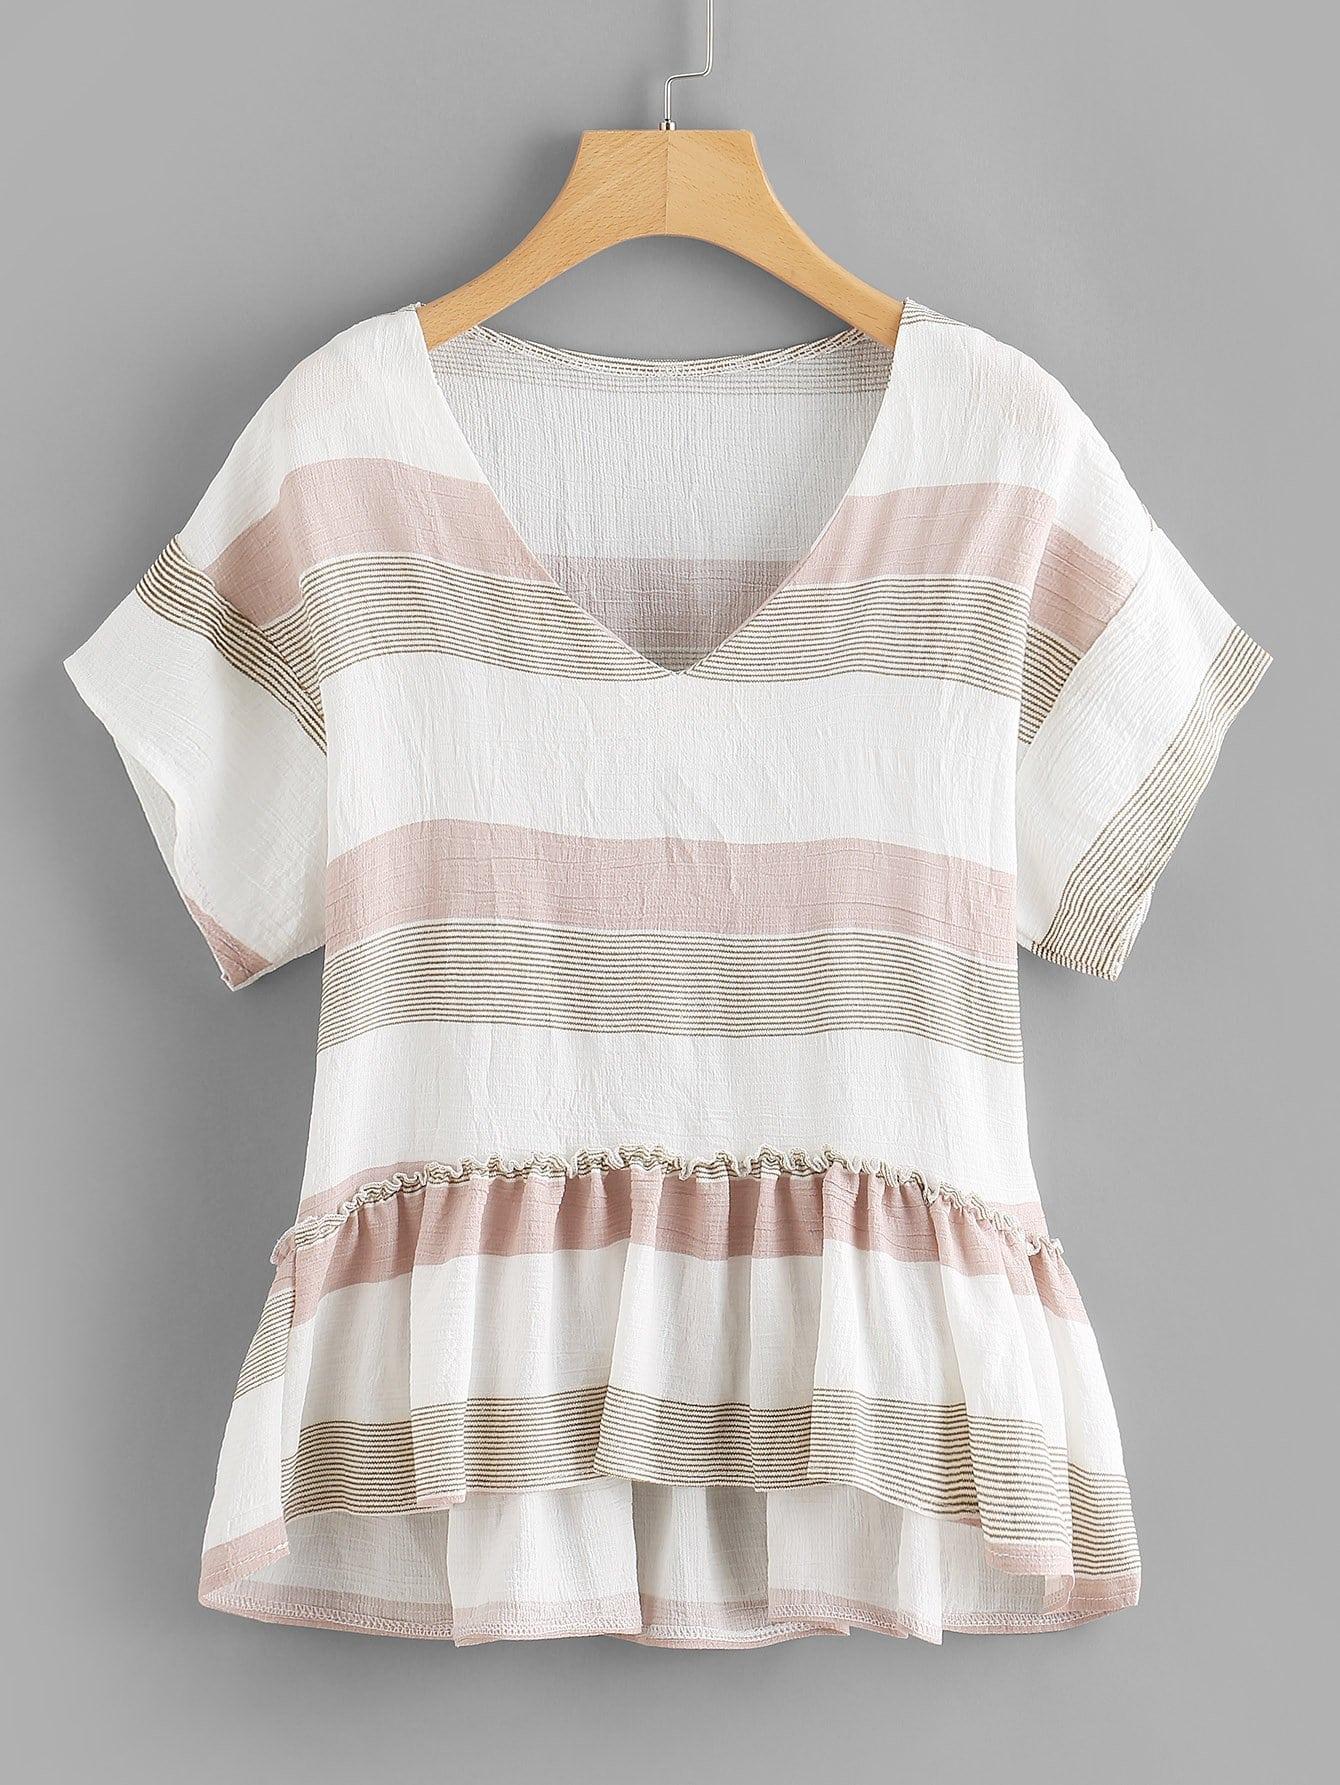 Contrast Striped Pep Hem Blouse contrast striped button back pep hem blouse